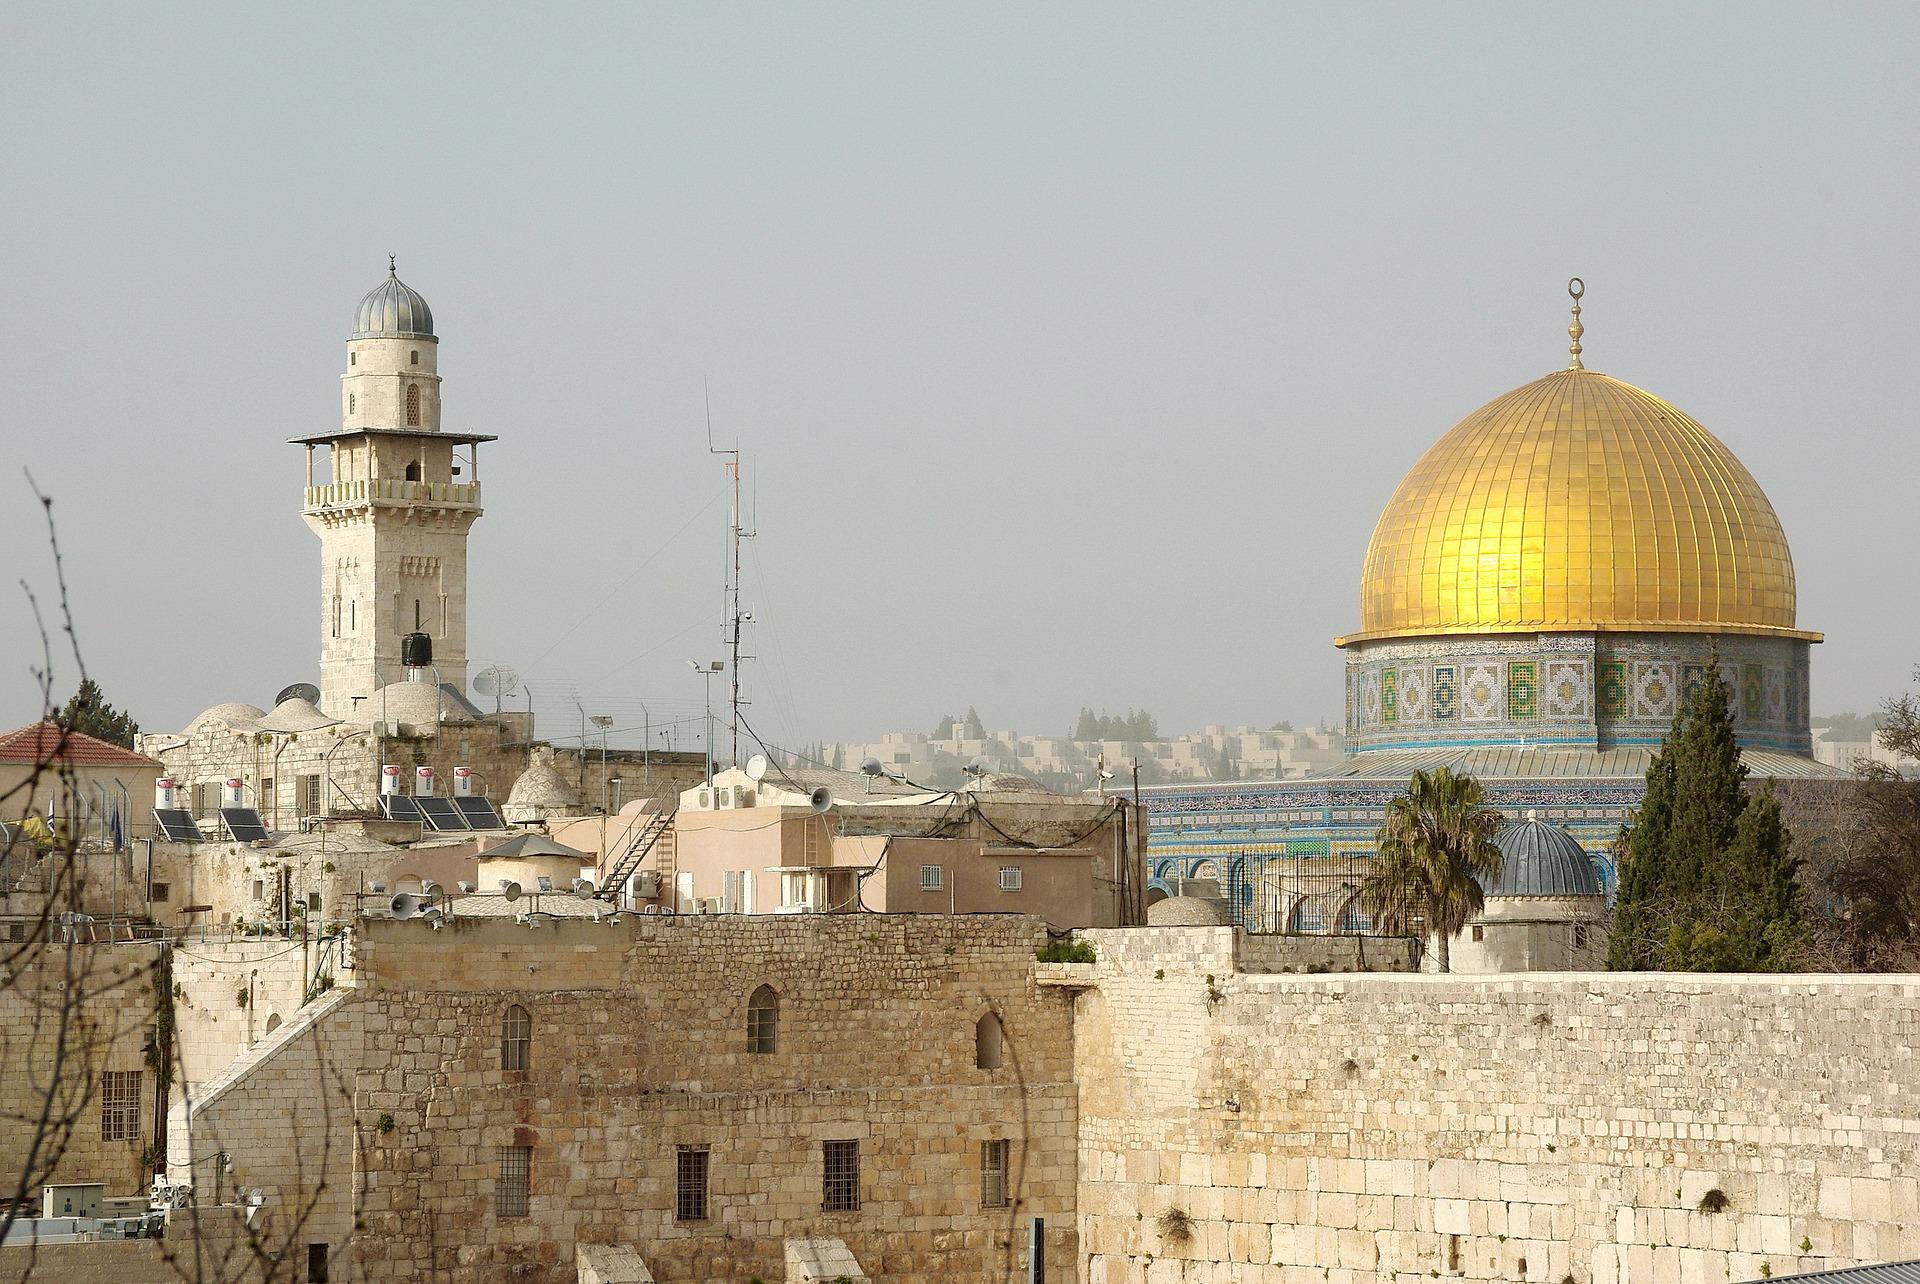 Gebed vanwege conflict Israël en Palestina in Gaza